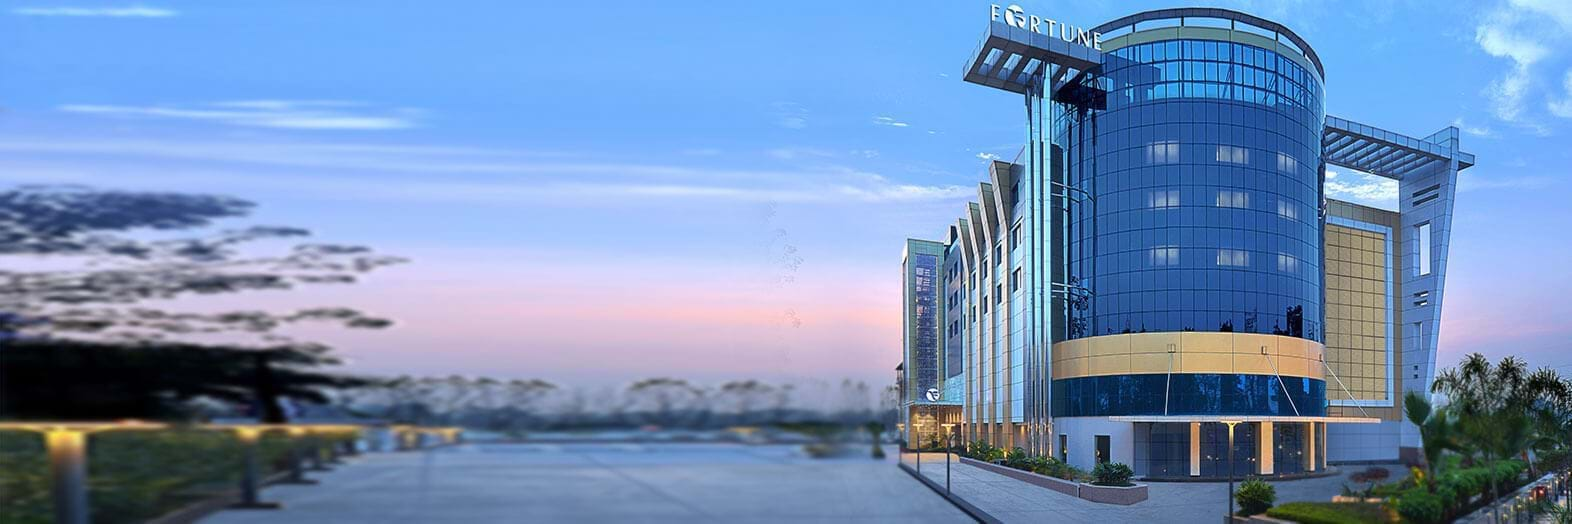 Hotels in Haridwar - Fortune Park, Haridwar